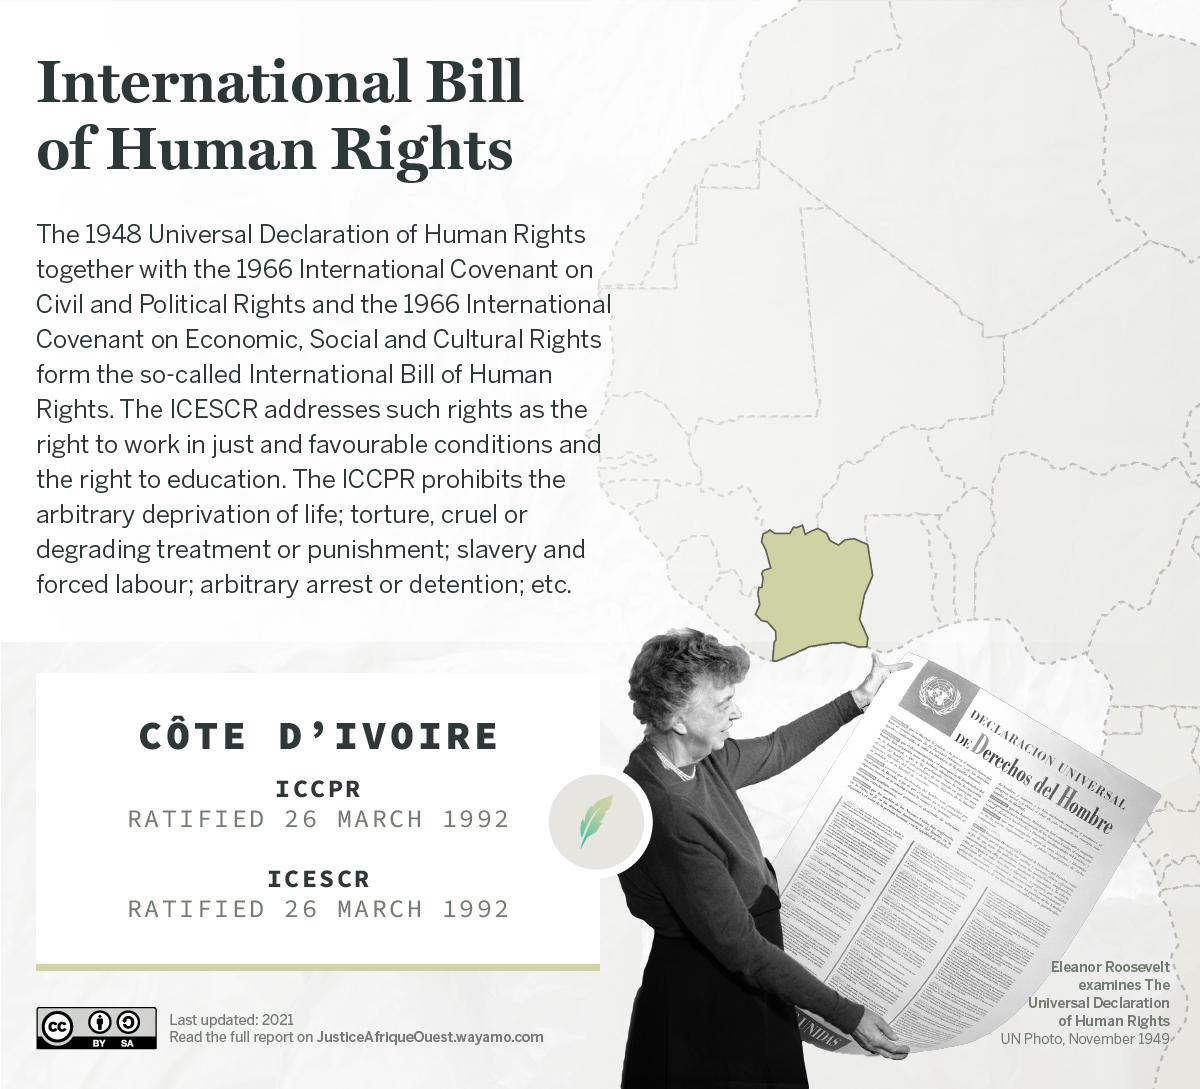 COTE D'IVOIRE_International Bill of Human Rights - Wayamo Foundation (CC BY-SA 4.0)